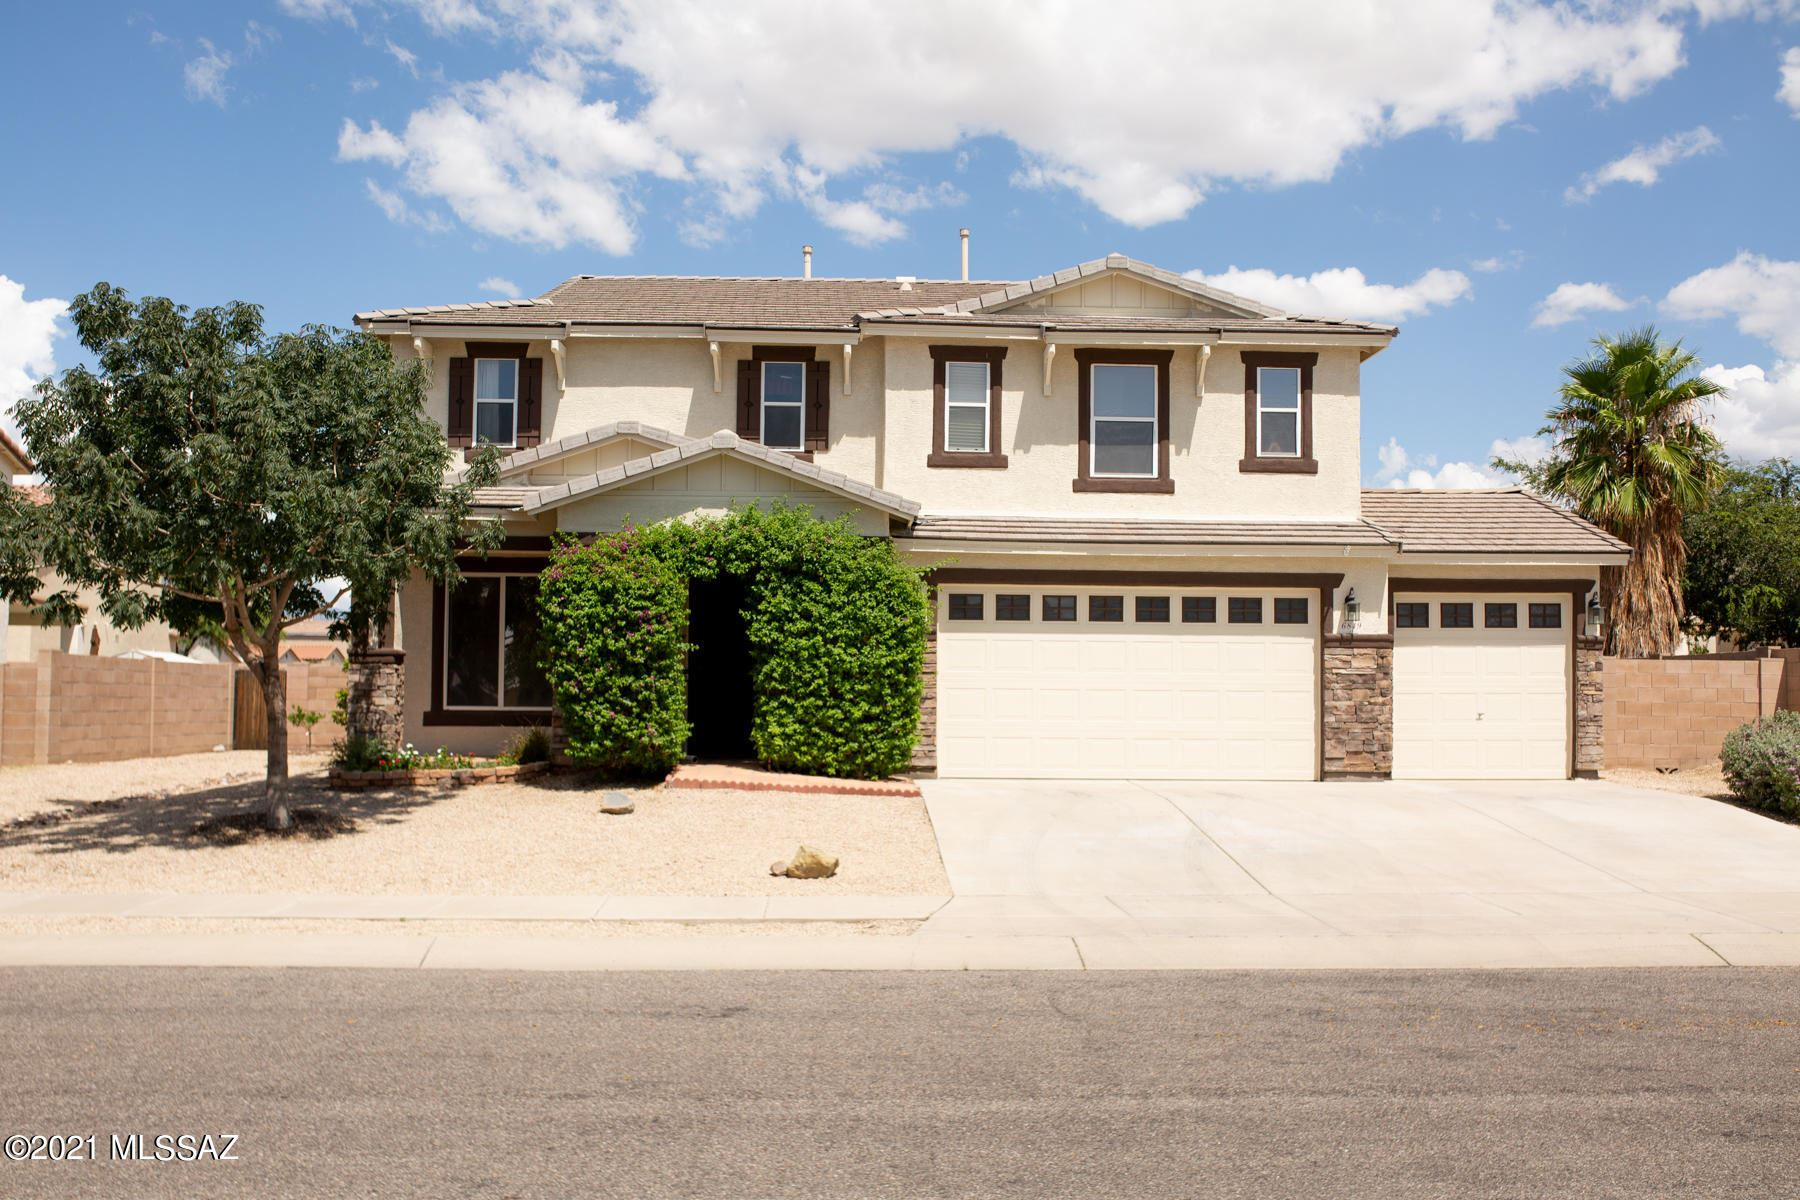 6849 S Yellow Star Drive, Tucson, AZ 85756 - MLS#: 22121832